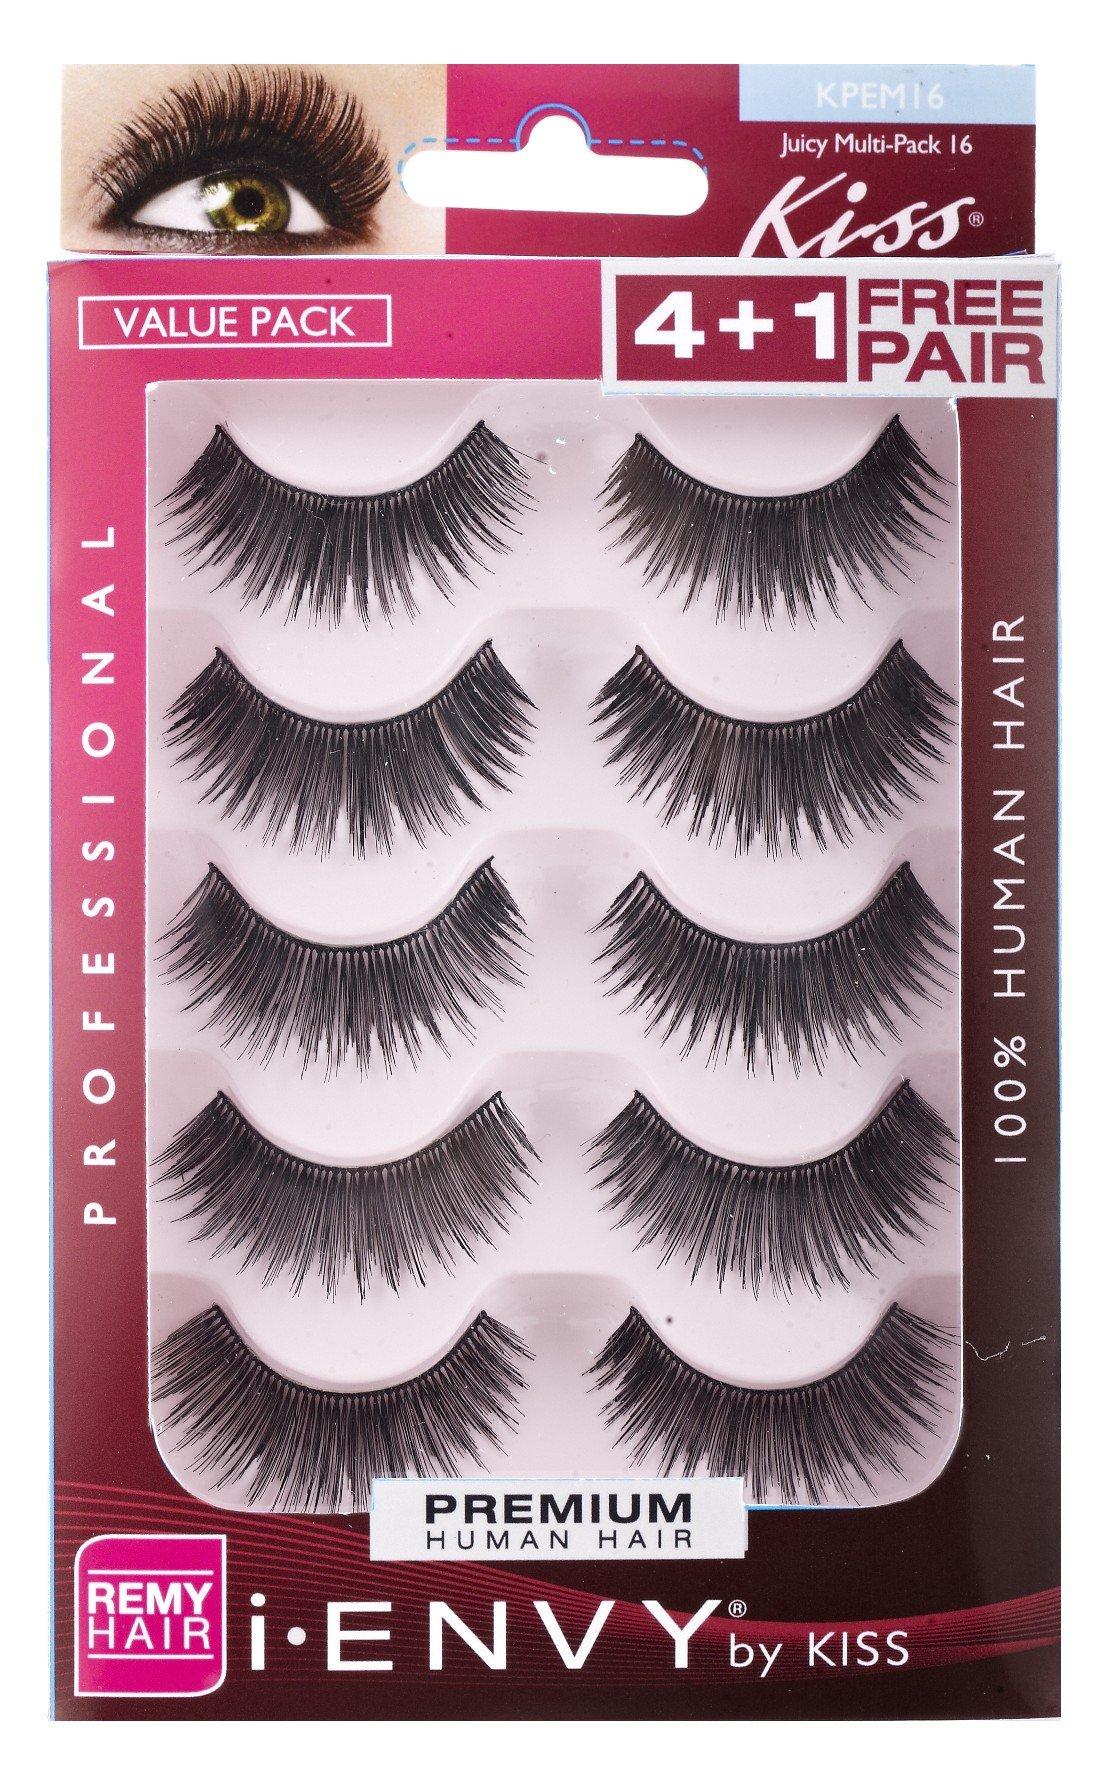 604af2d2c16 Amazon.com : i.Envy by Kiss Eye Lash Value Pack #KPEM15 : Beauty